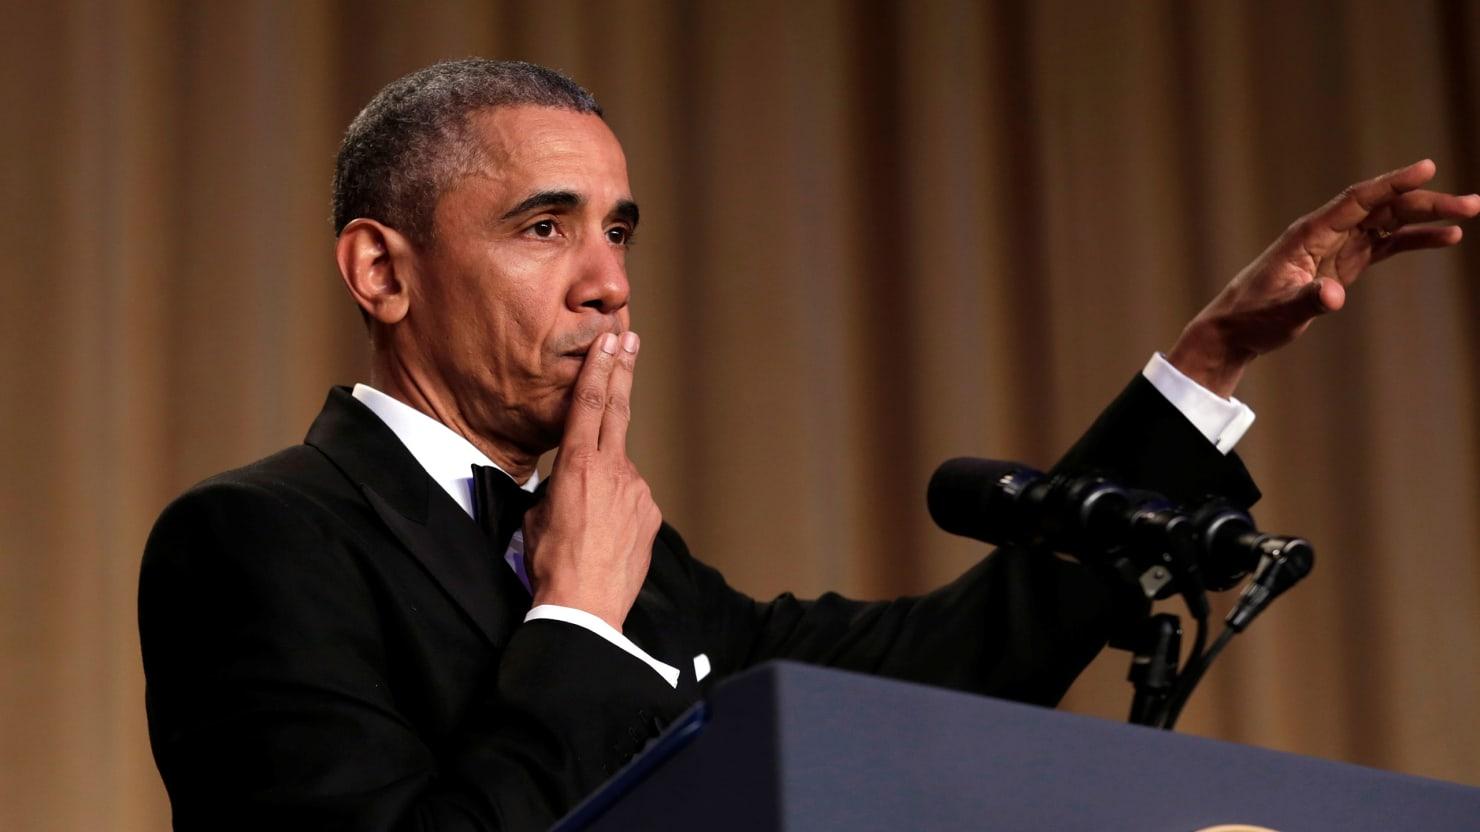 The Best White House Correspondents Dinner Jokes Of All Time